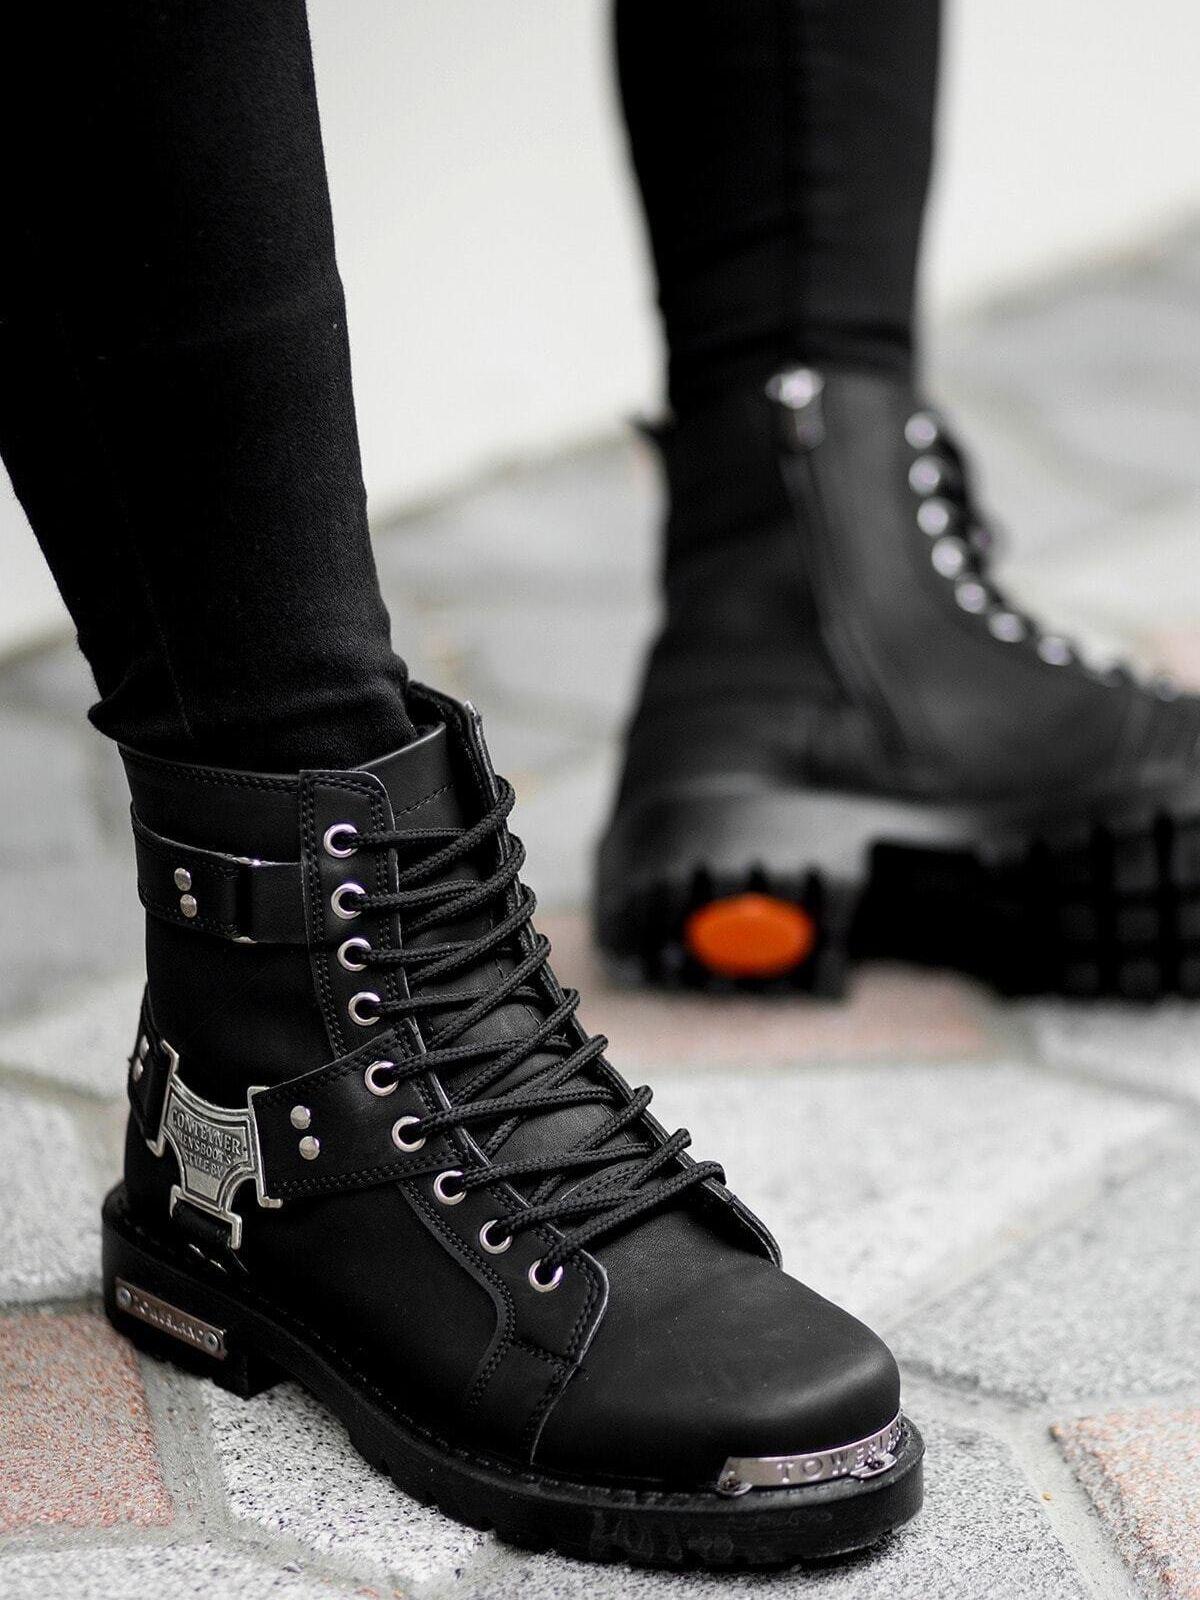 Men's winter boot biker boot Black Motorcycle Boots Metal Decor winter boot men's boot shoes Men's Ankle Boots High Quality Work